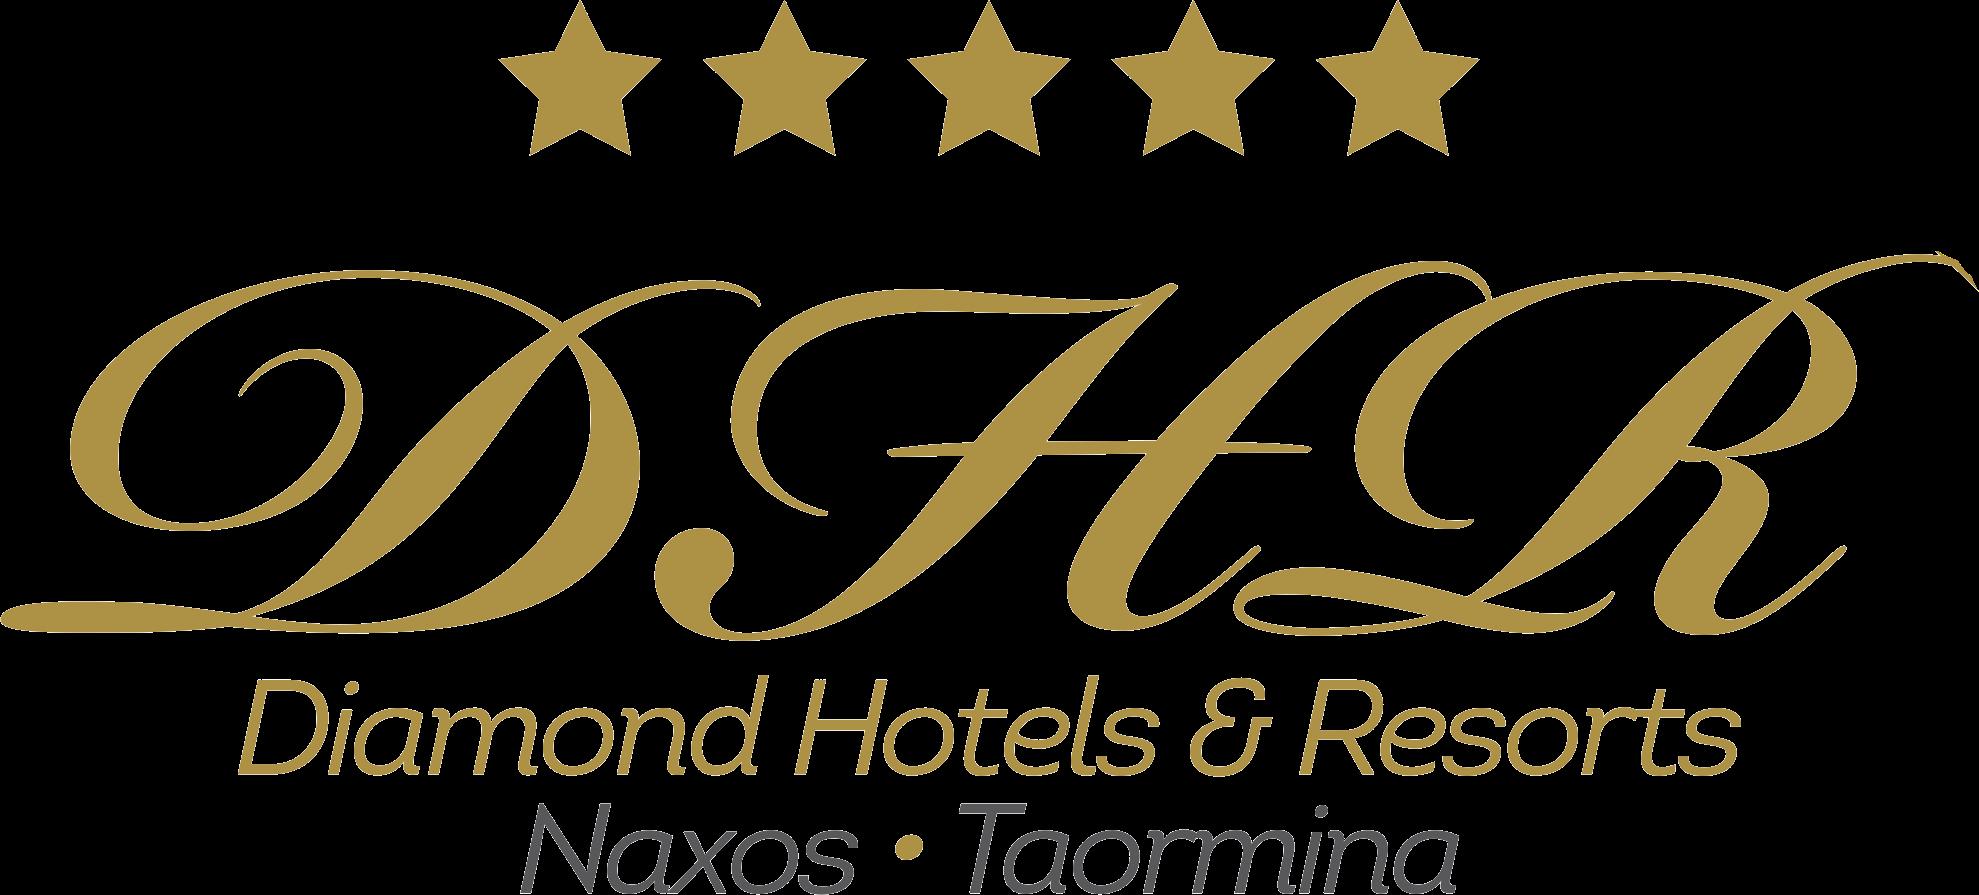 ART HOTEL DIAMOND NAXOS TAORMINA